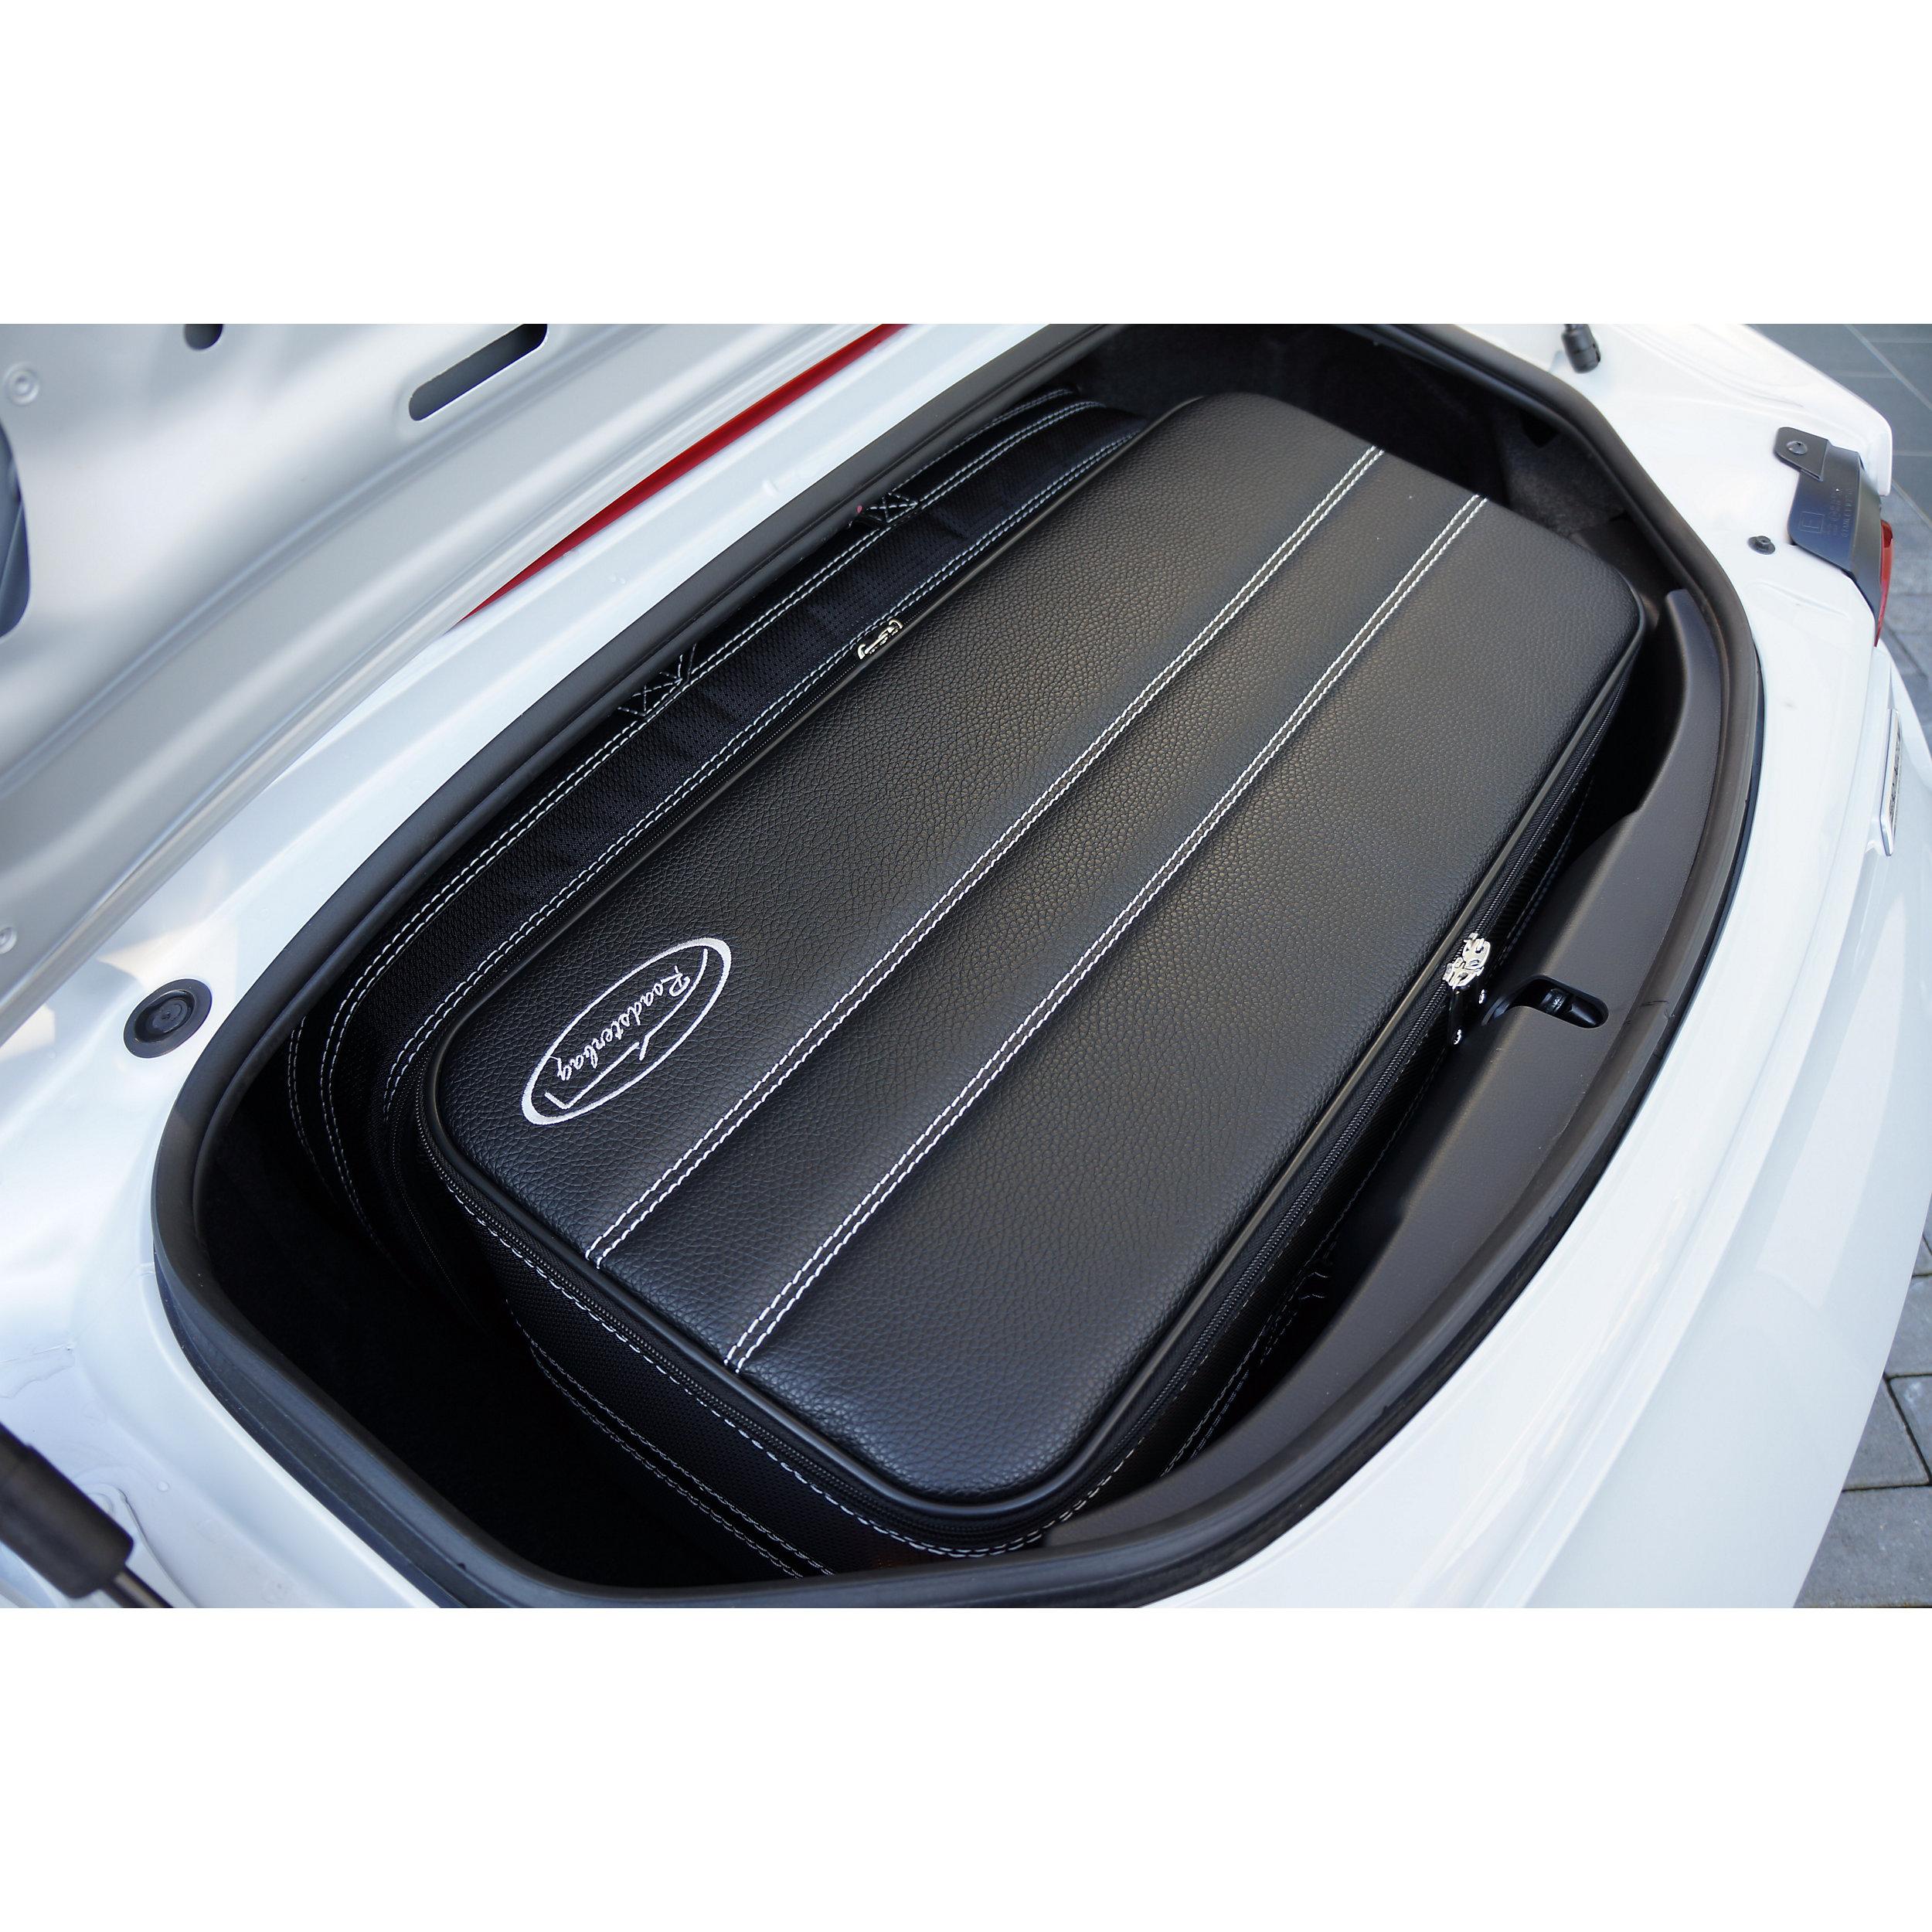 3-tlg. Kofferset Mazda MX-5 ND 89 Liter